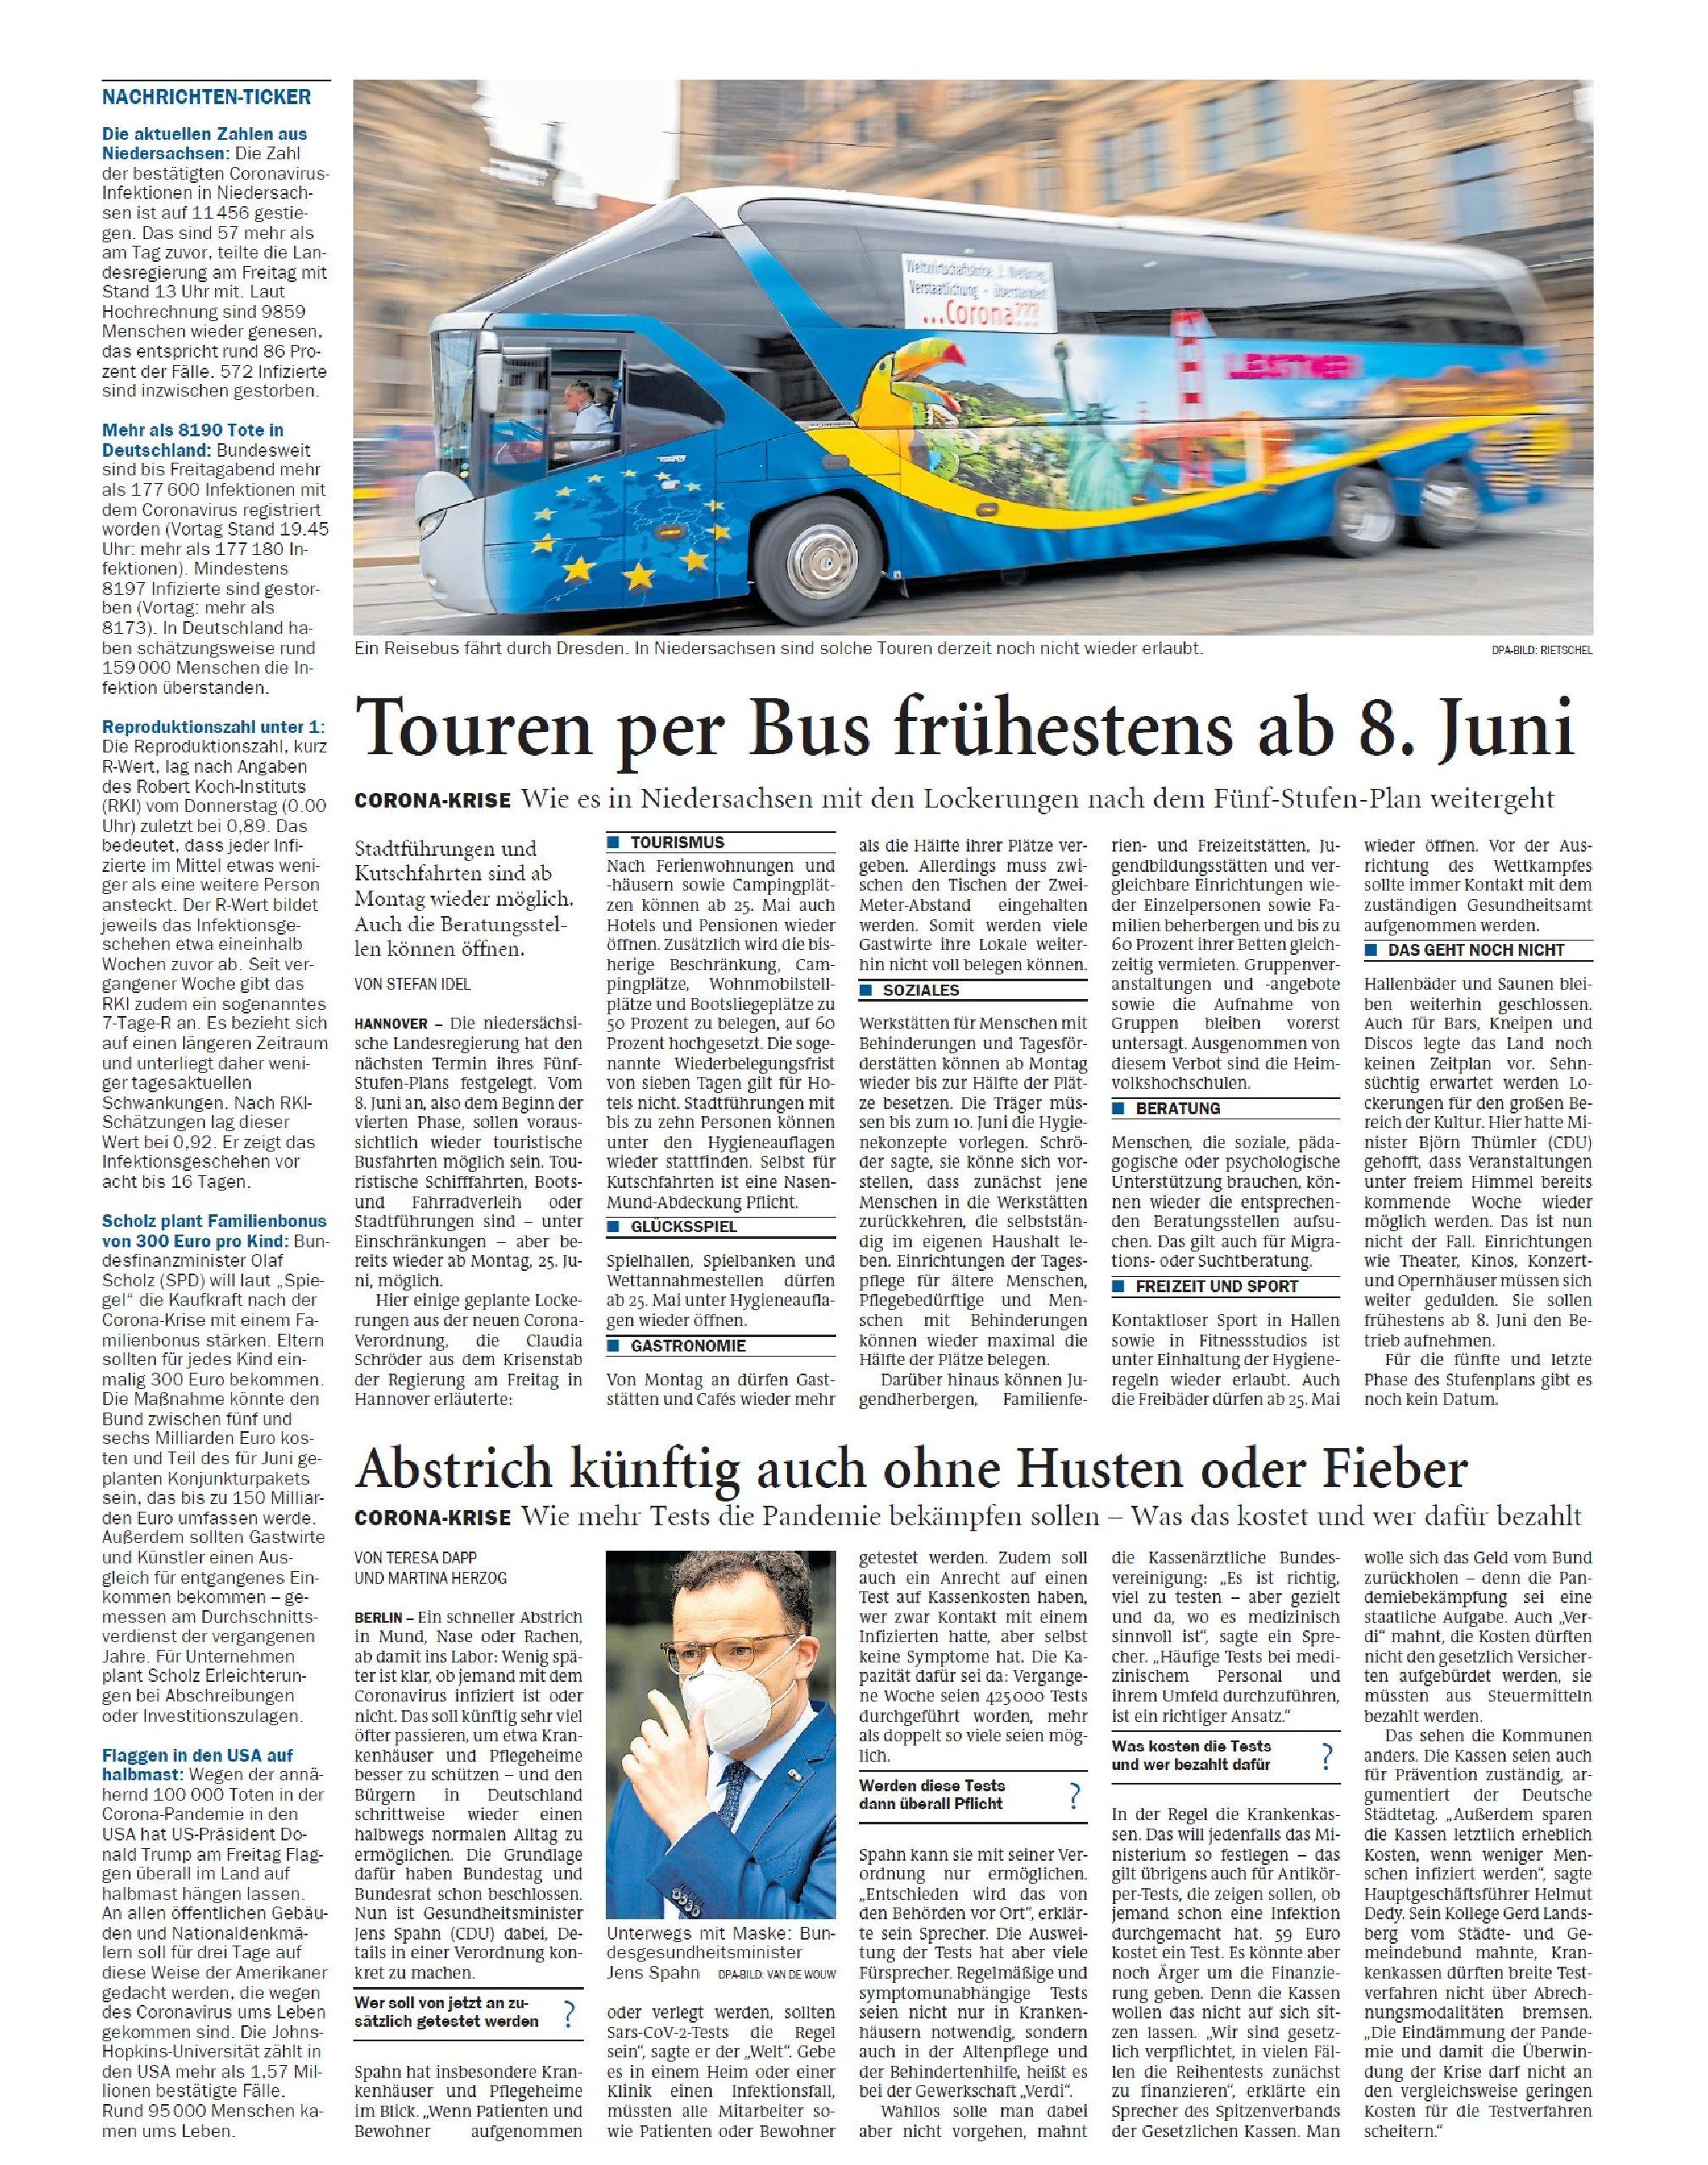 Jeversches Wochenblatt 23.05.2020 III